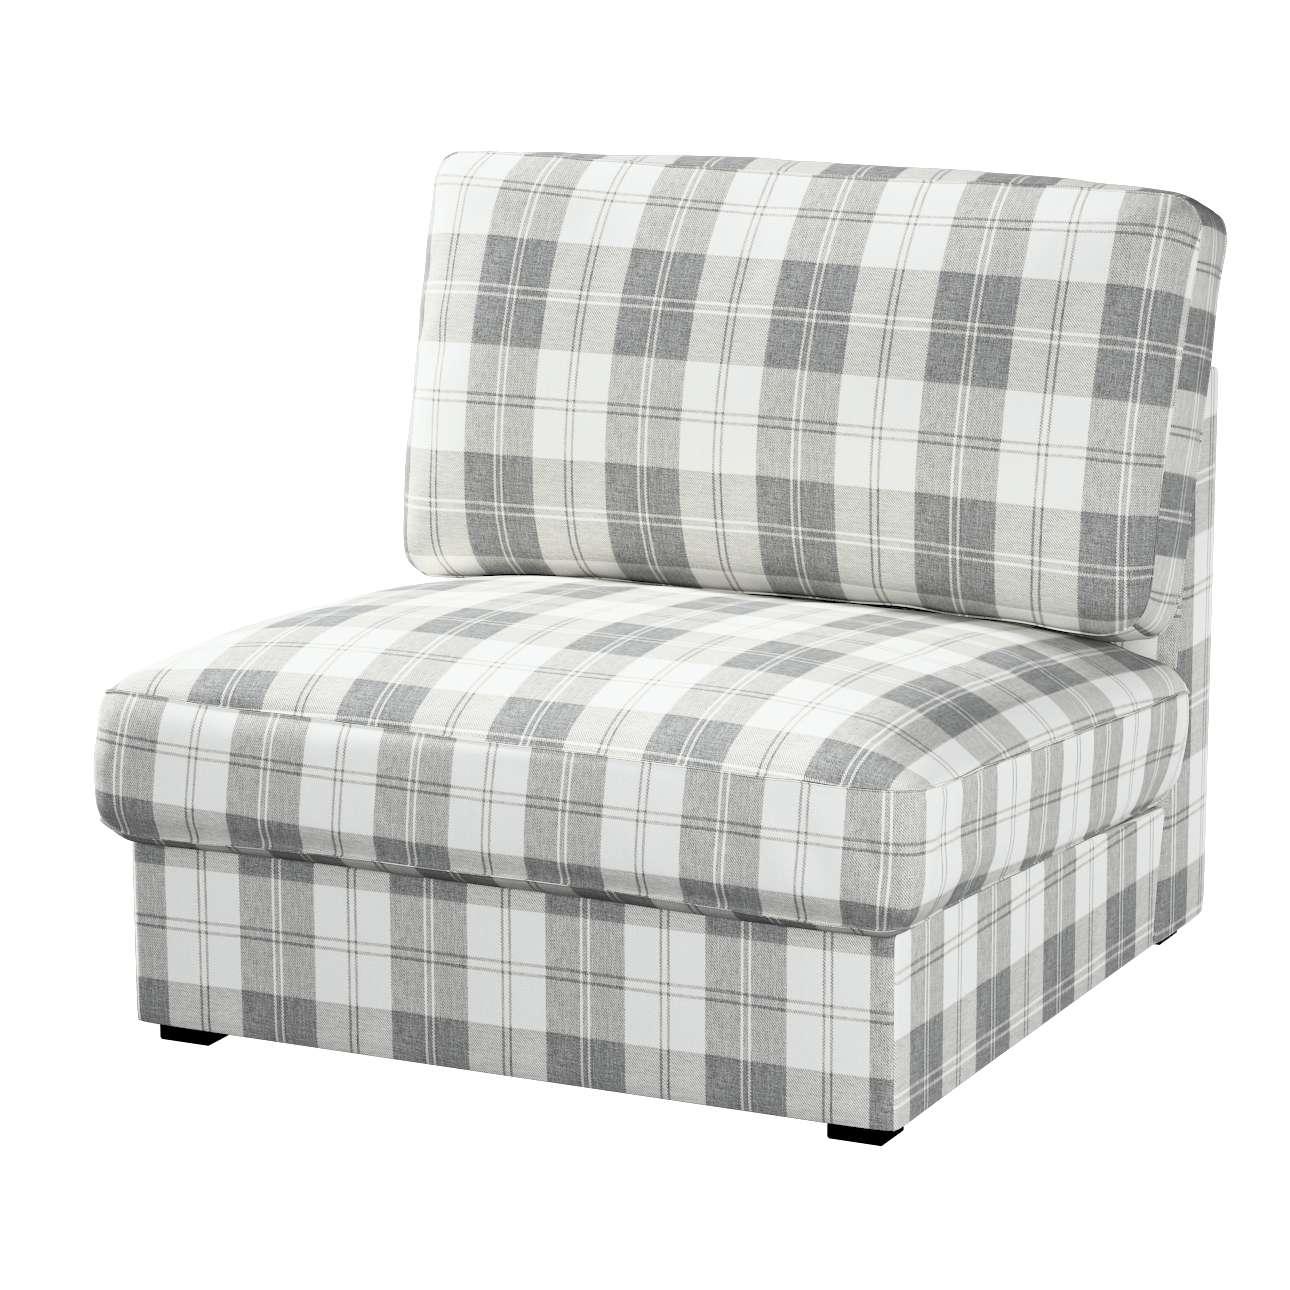 kivik sesselbezug wei grau dekoria. Black Bedroom Furniture Sets. Home Design Ideas